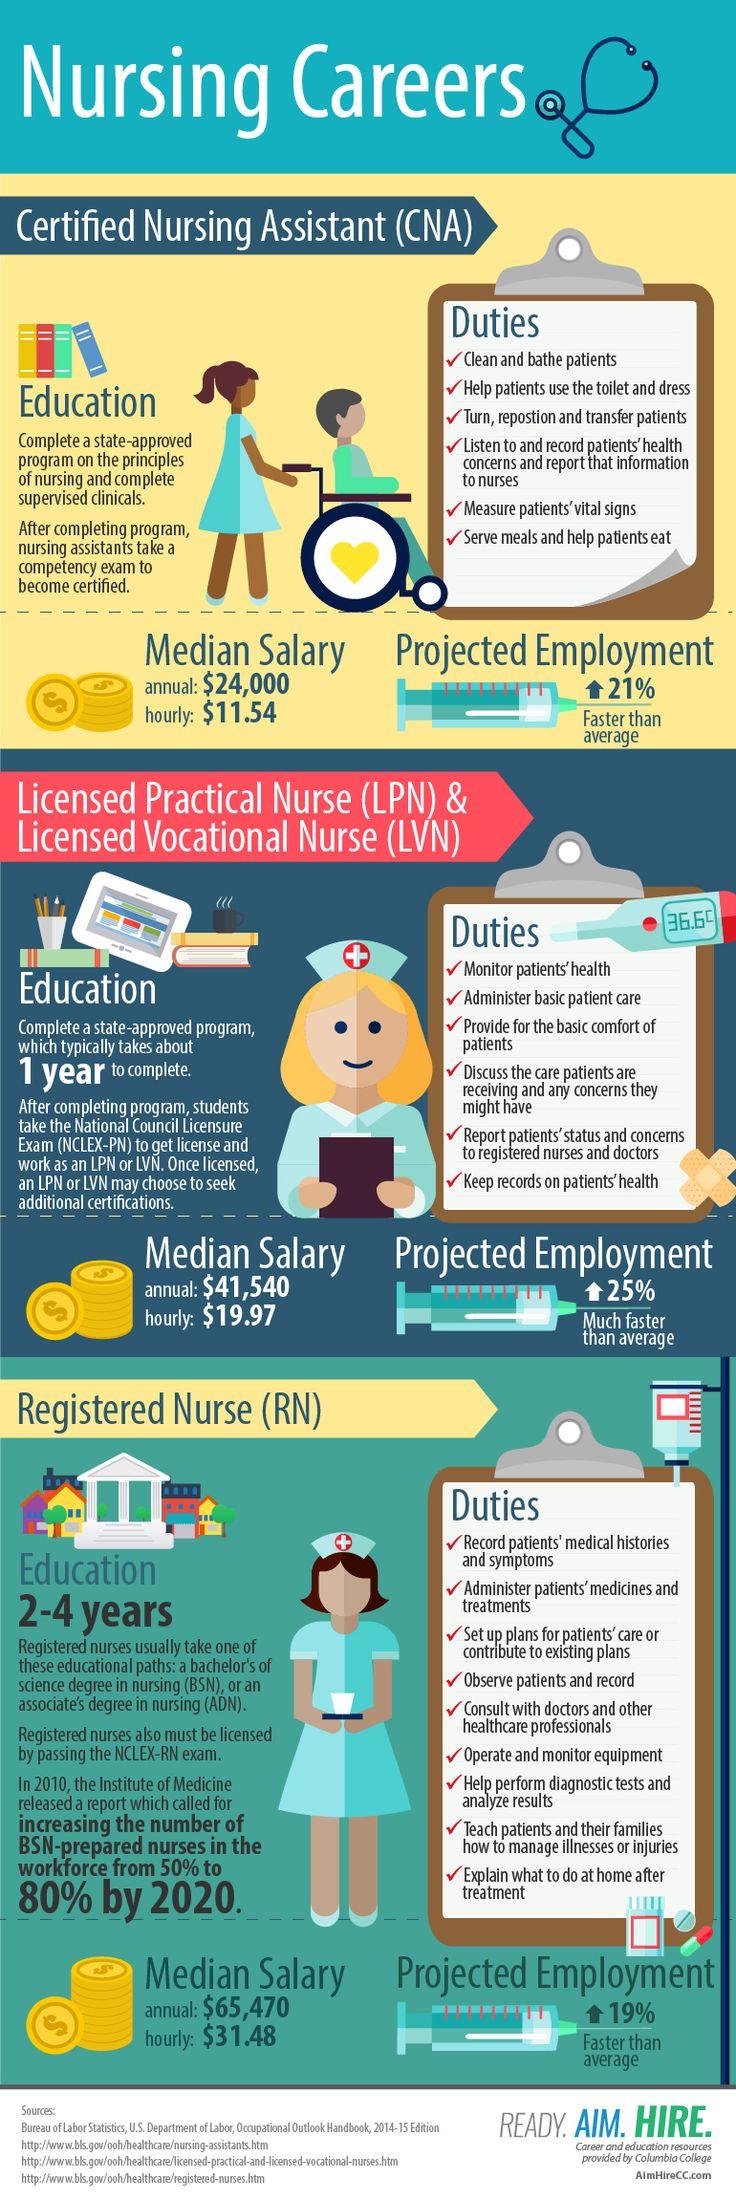 nursing careers infographic, lpn, cna, rn, lvn registered nurse - median salary, projected employment numbers for education level